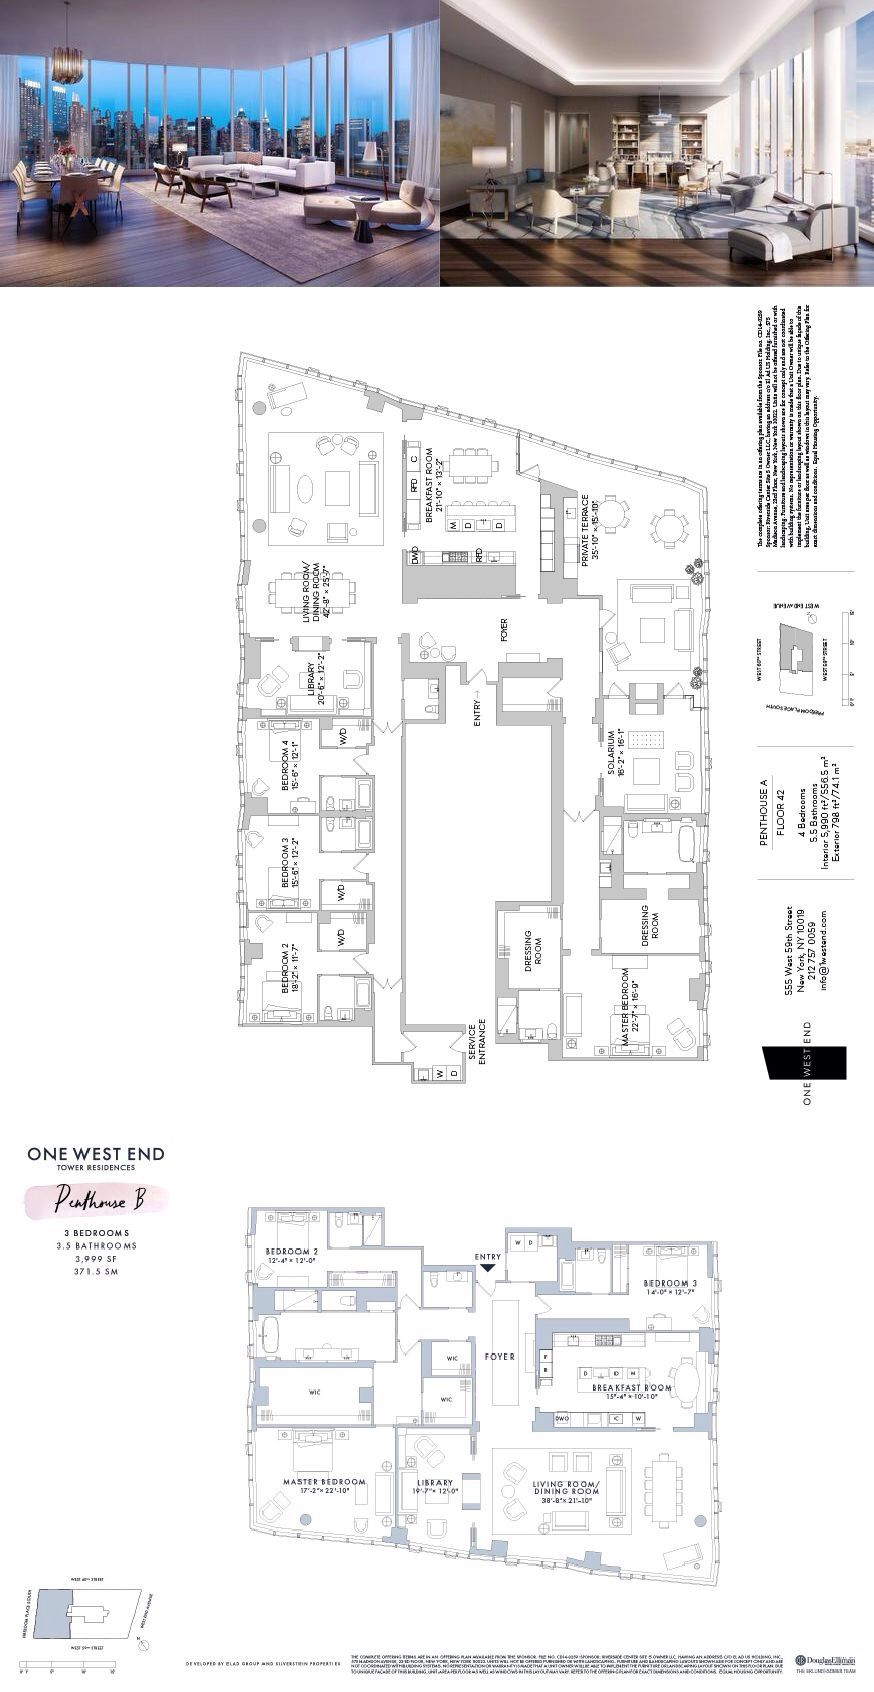 One West End 1 West End Avenue Phb Pha Upper West Side New York Douglas Elliman Penthouse Apartment Floor Plan Floor Plans Apartment Floor Plans